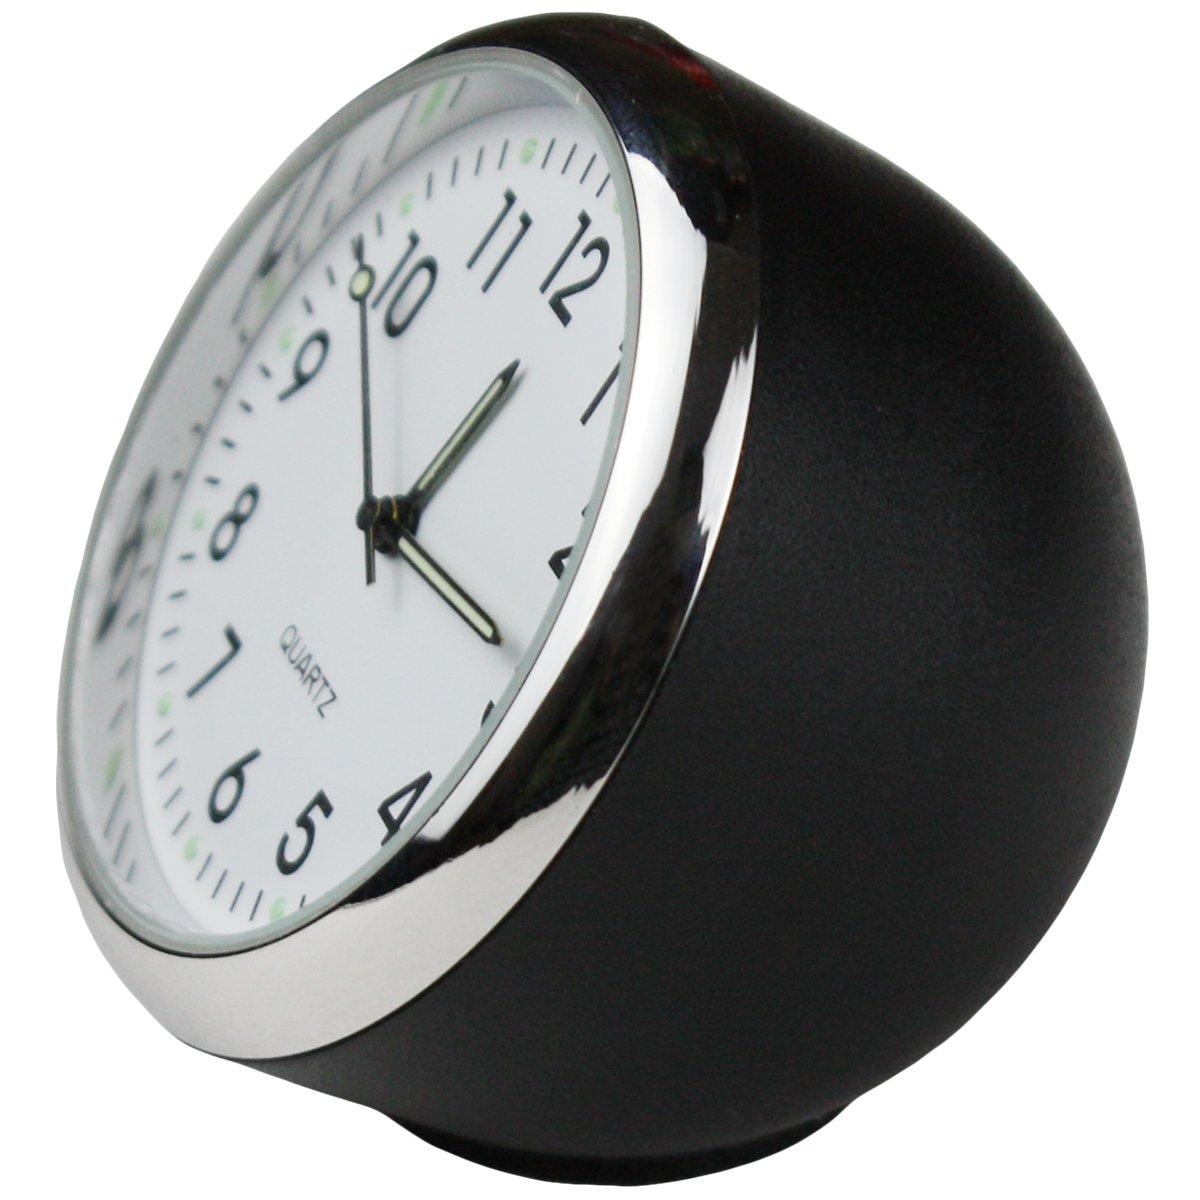 Txian Custom High Accuracy Car Clock Small Round Onboard Quartz Clock Perfect Car Decoration white dial /& white shell